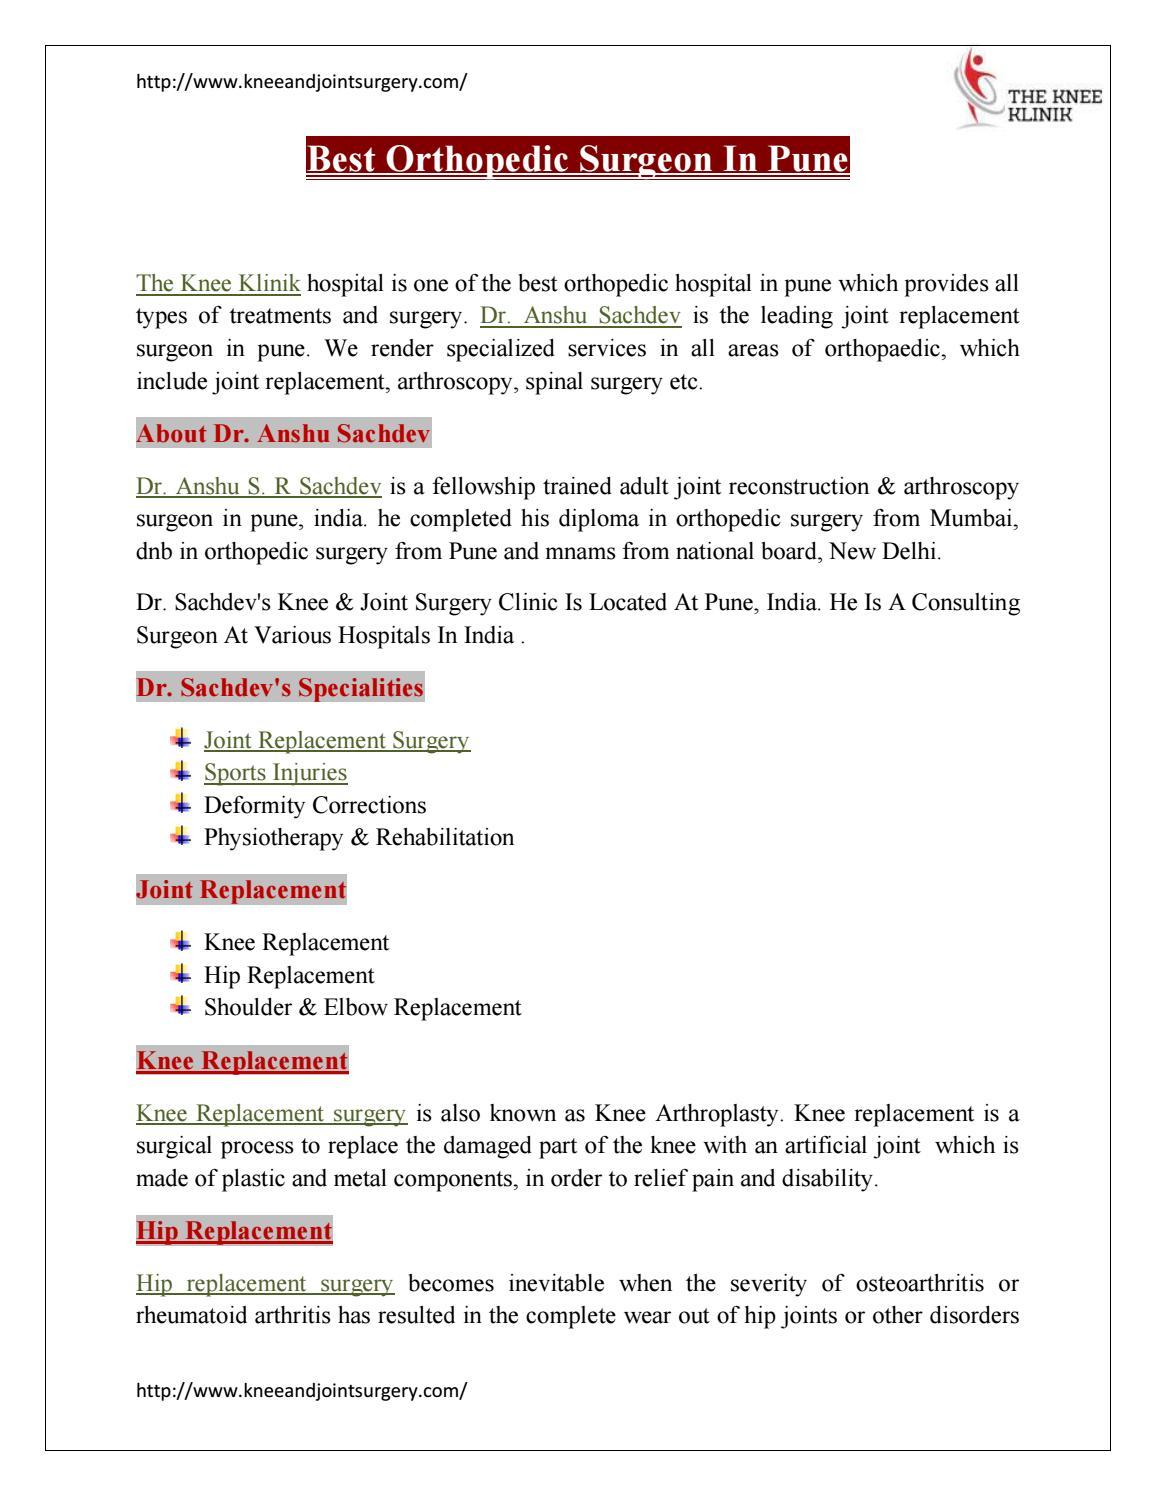 Best Orthopedic Clinic |surgery In Pune | Thekneeklinik by